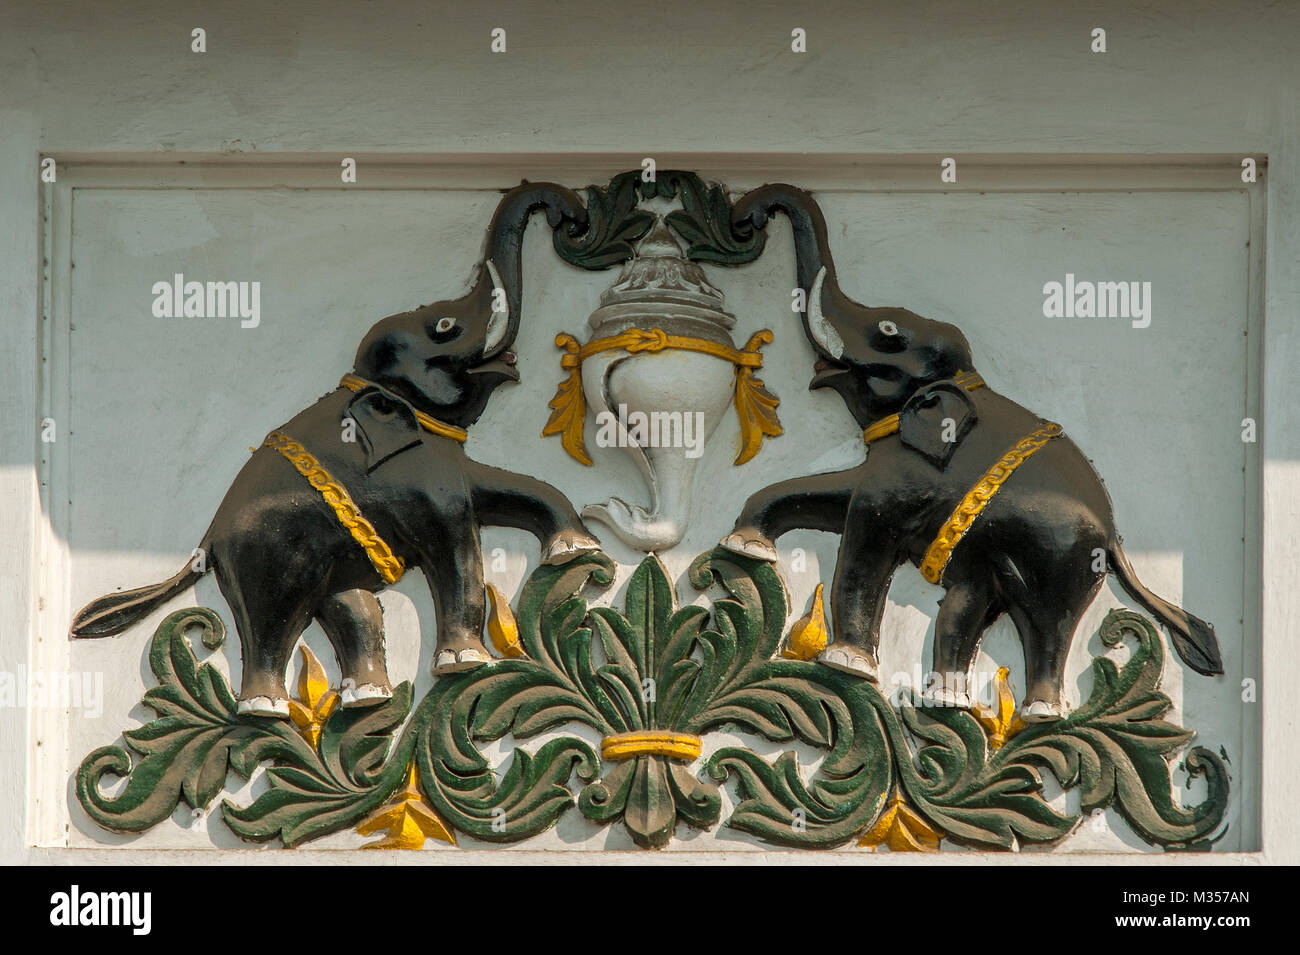 Coat of arms in stucco work, Travancore emblem, Kerala, India, Asia - Stock Image